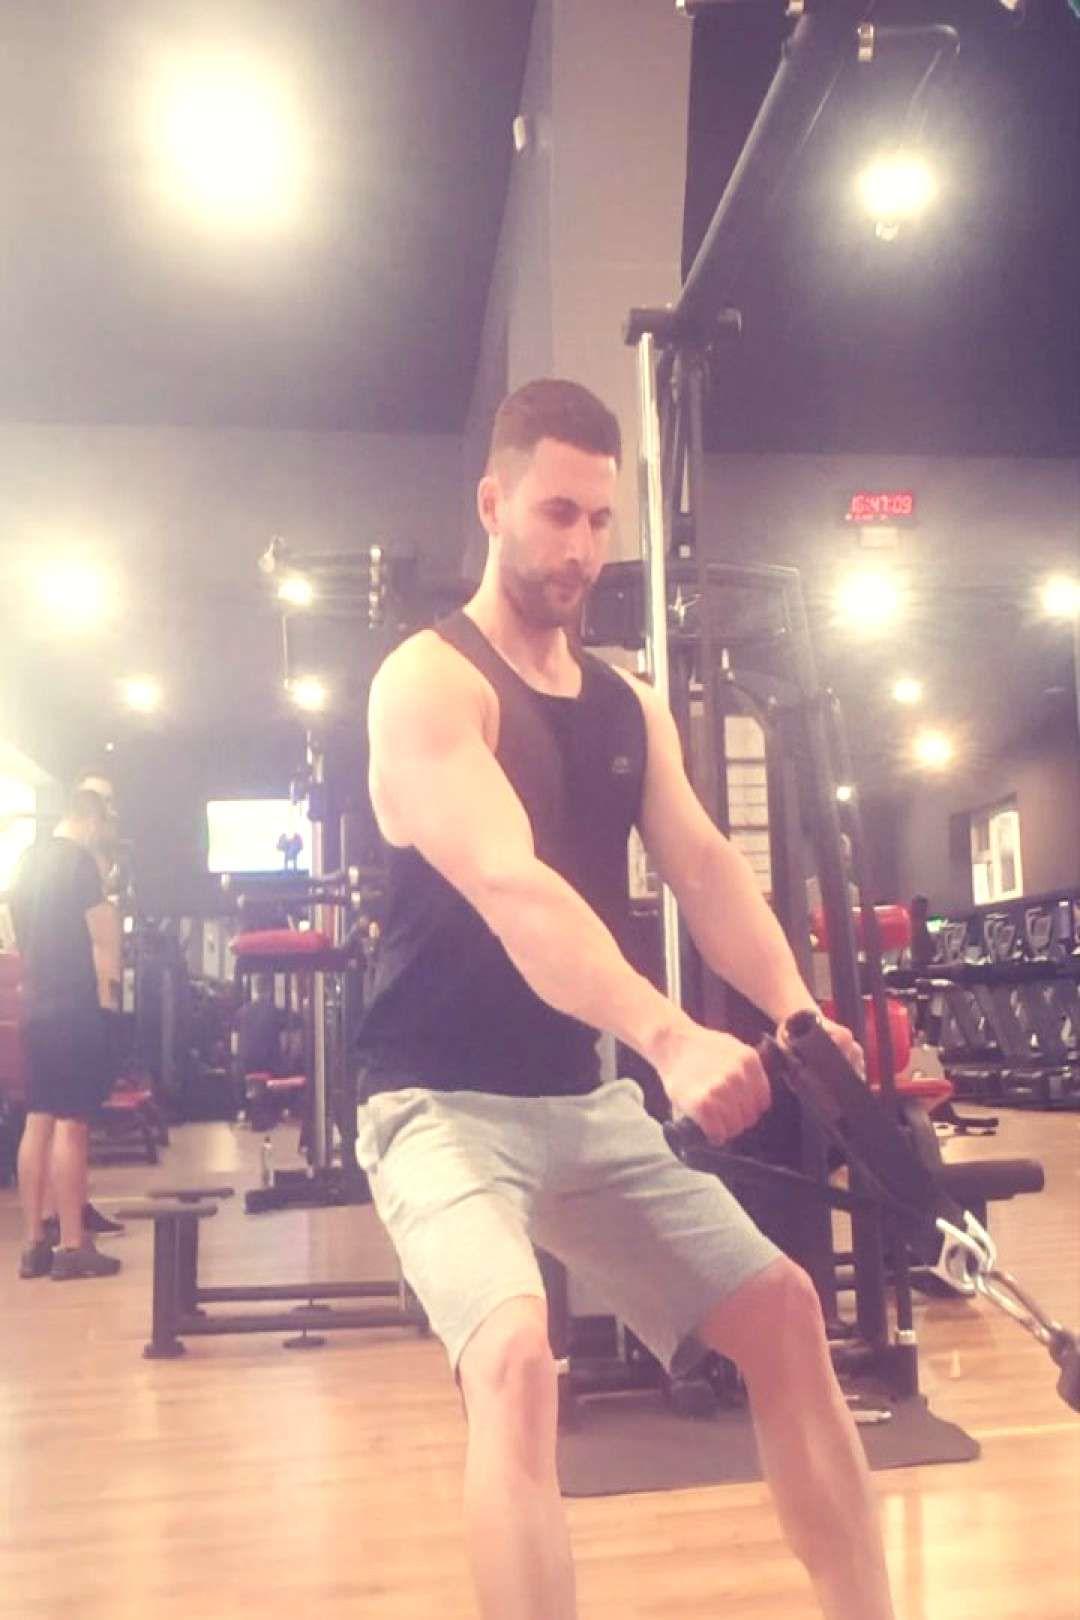 #fitnesstraining #workouttime #backworkout #backday #fitness #gym #workouttime #backworkout #backday...